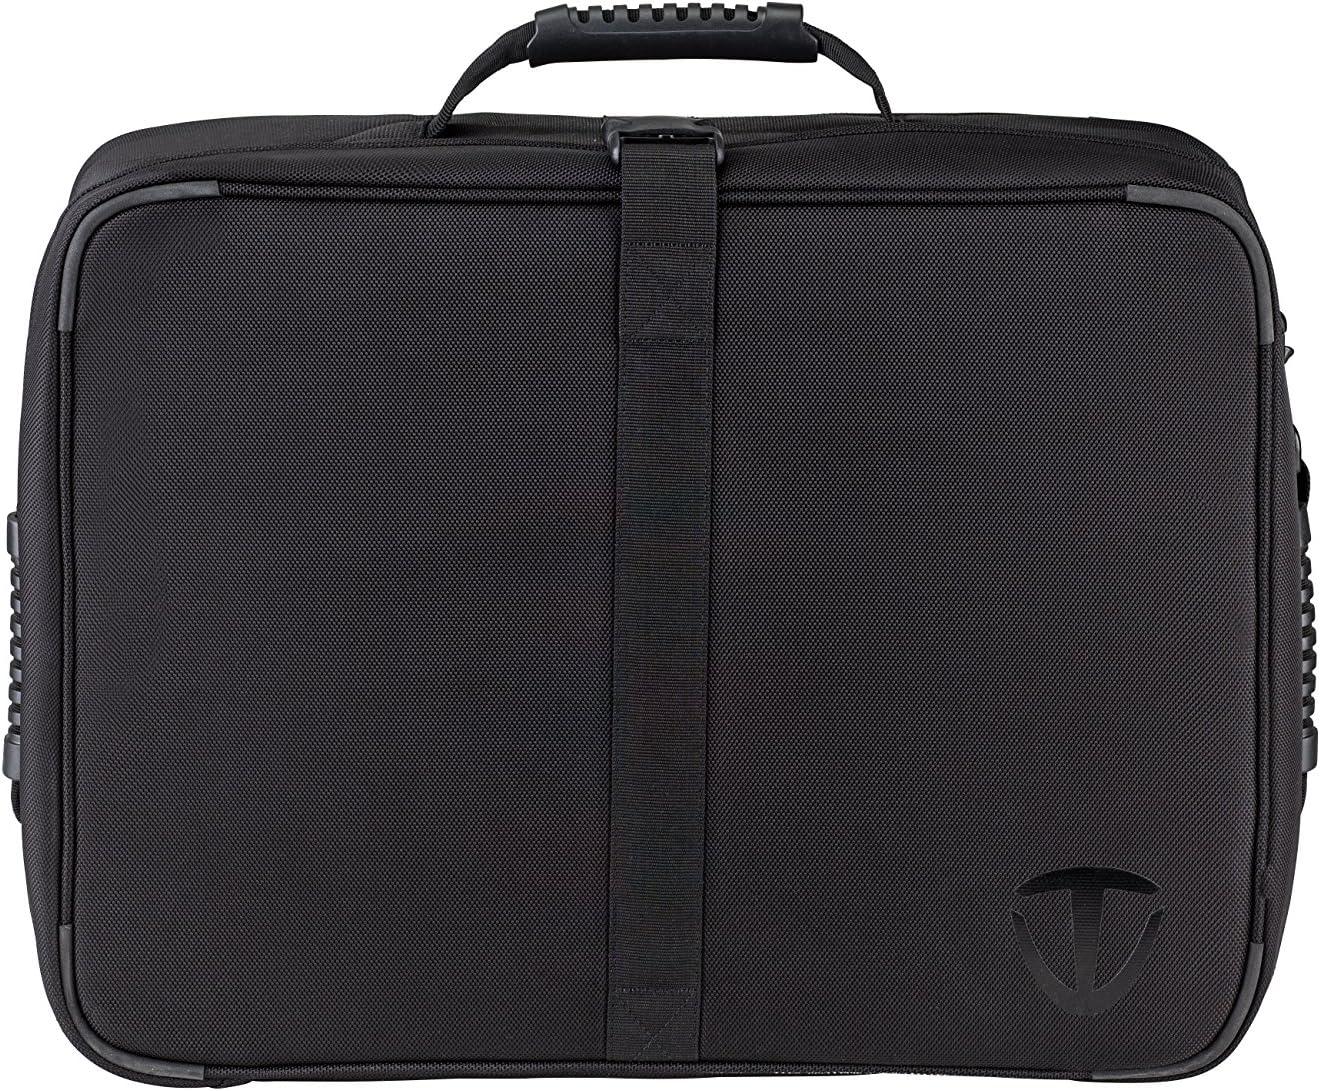 634-223 Tenba Transport Air Case Attache 2214W